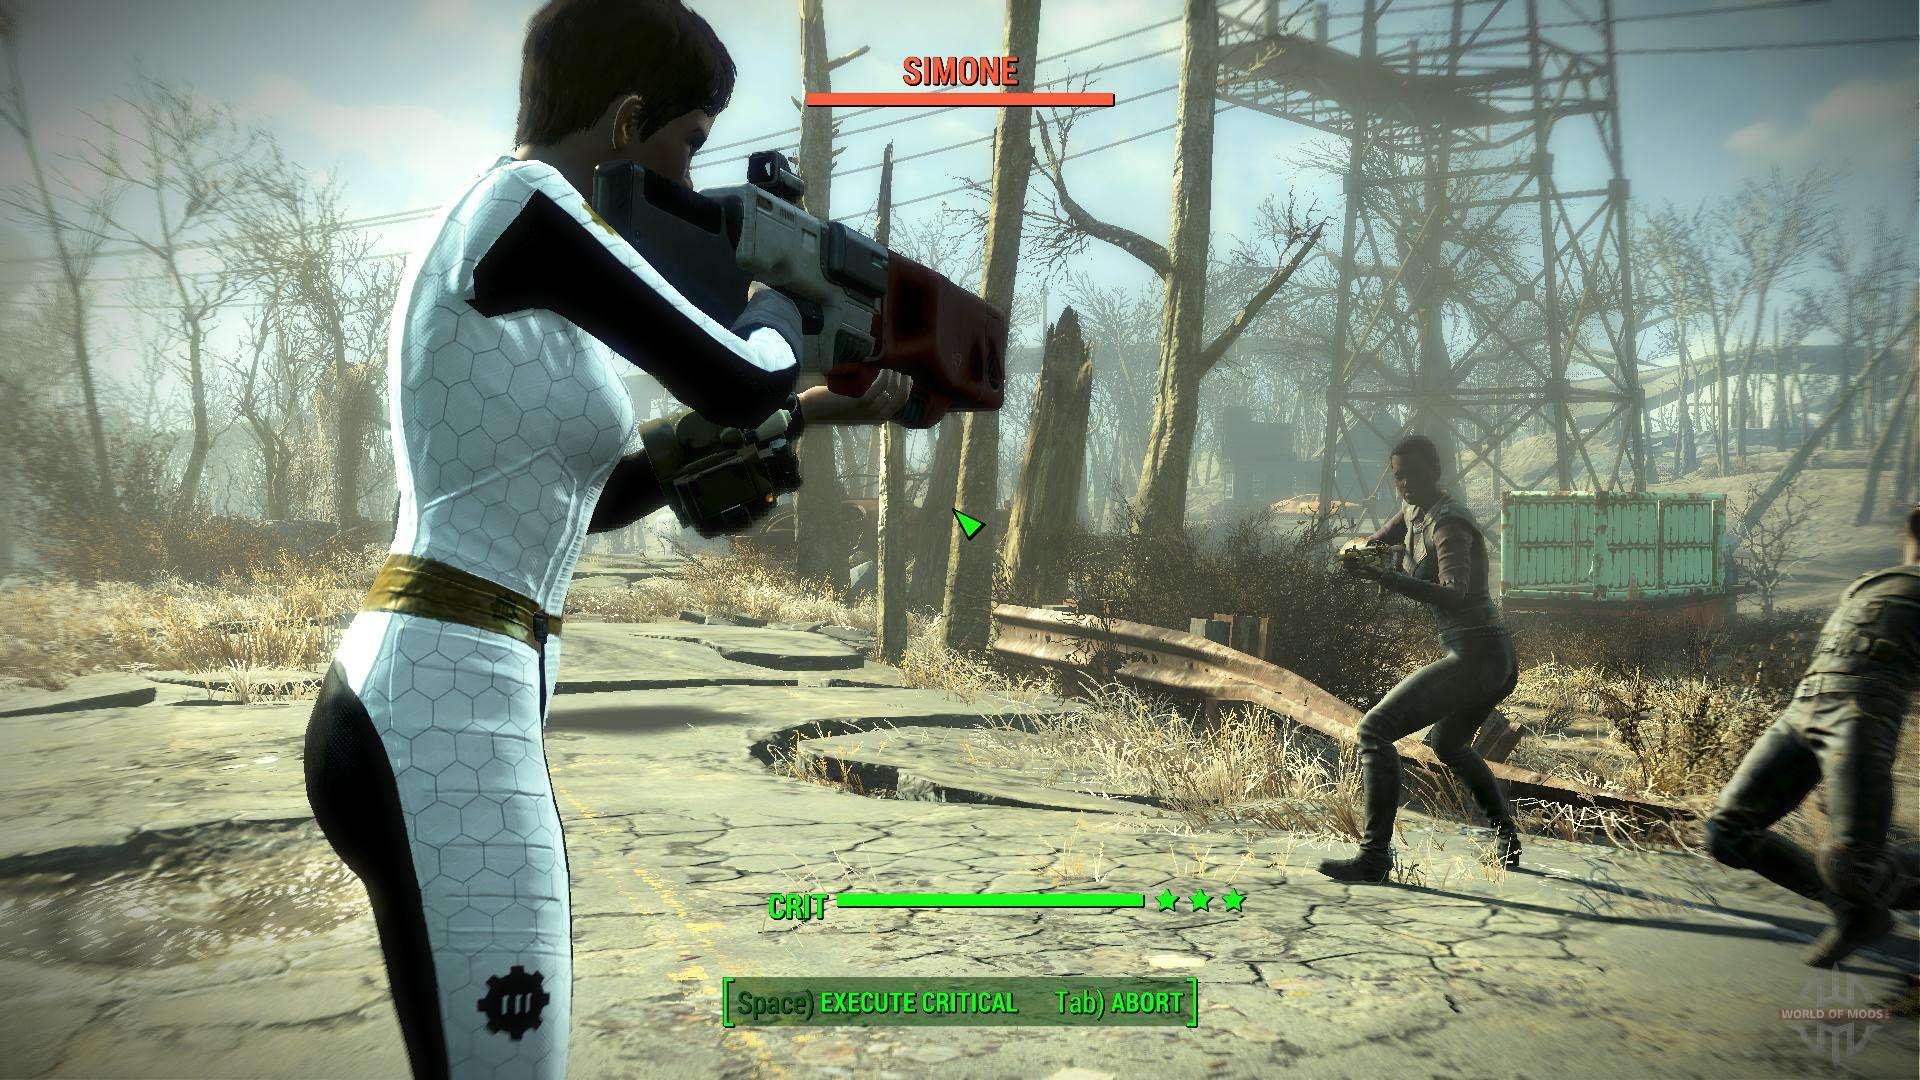 Crucified trooper | Fallout Wiki | FANDOM powered by Wikia